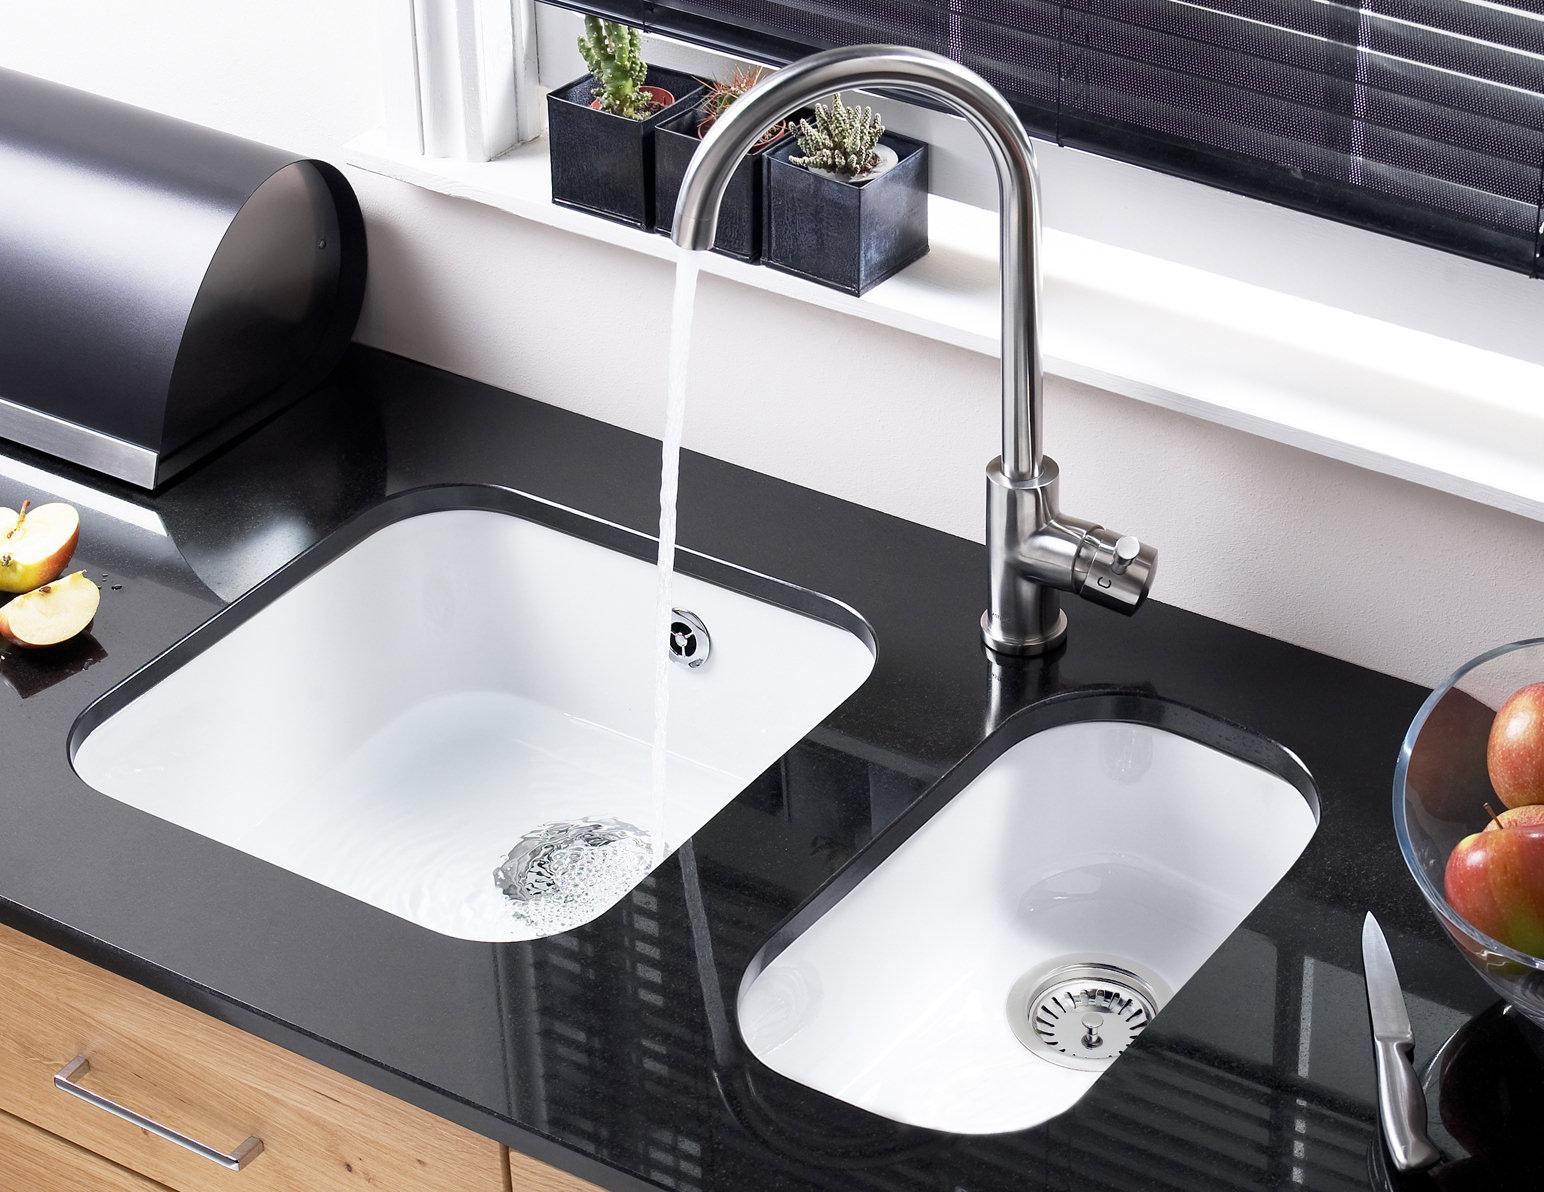 Astracast Lincoln 4040 White Ceramic Undermount Sink